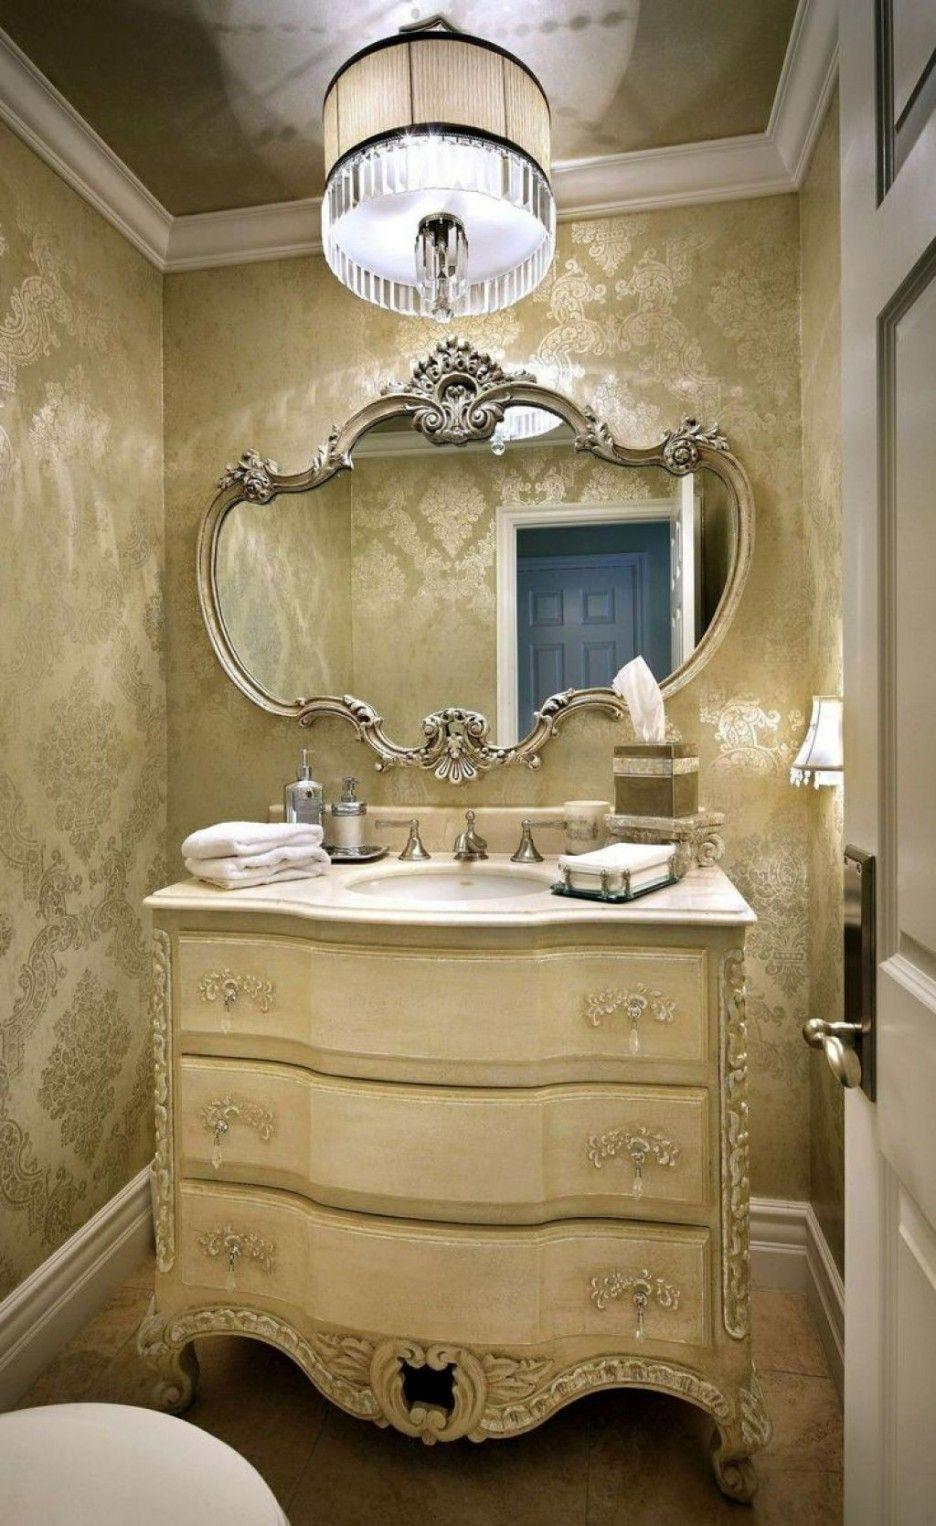 Bathroom how to decorate powder bathroom ideas luxury powder bathroom - Bathroom Luxury Stylish Powder Rooms Vanity Decoration Elegant Powder Room Gold Nuance Feature Pretty